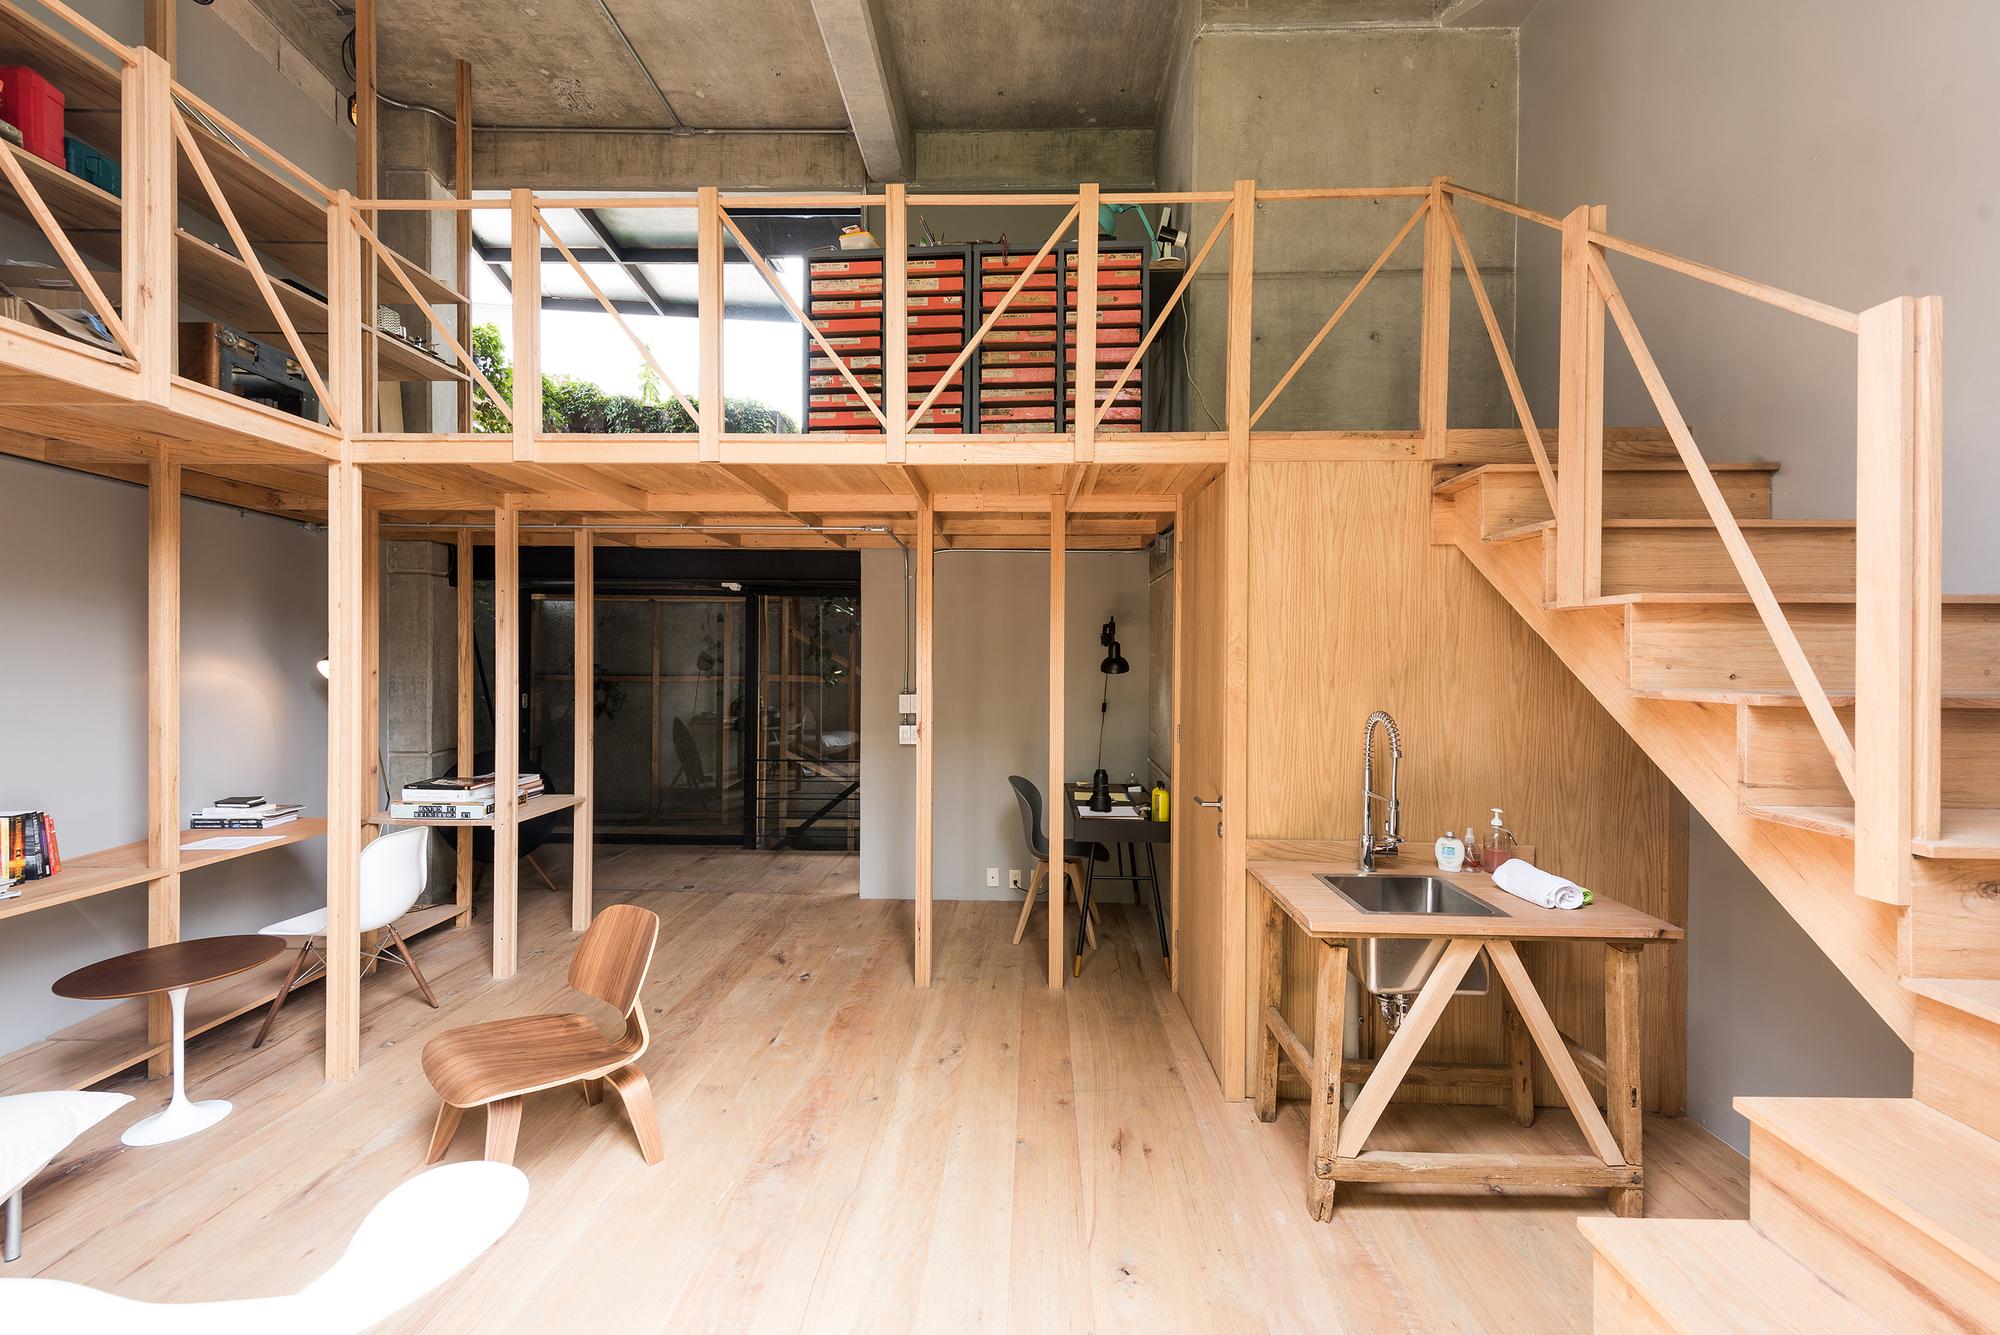 gallery of essay spatial prosthesis manada architectural  essay 4 spatial prosthesis manada architectural boundaries